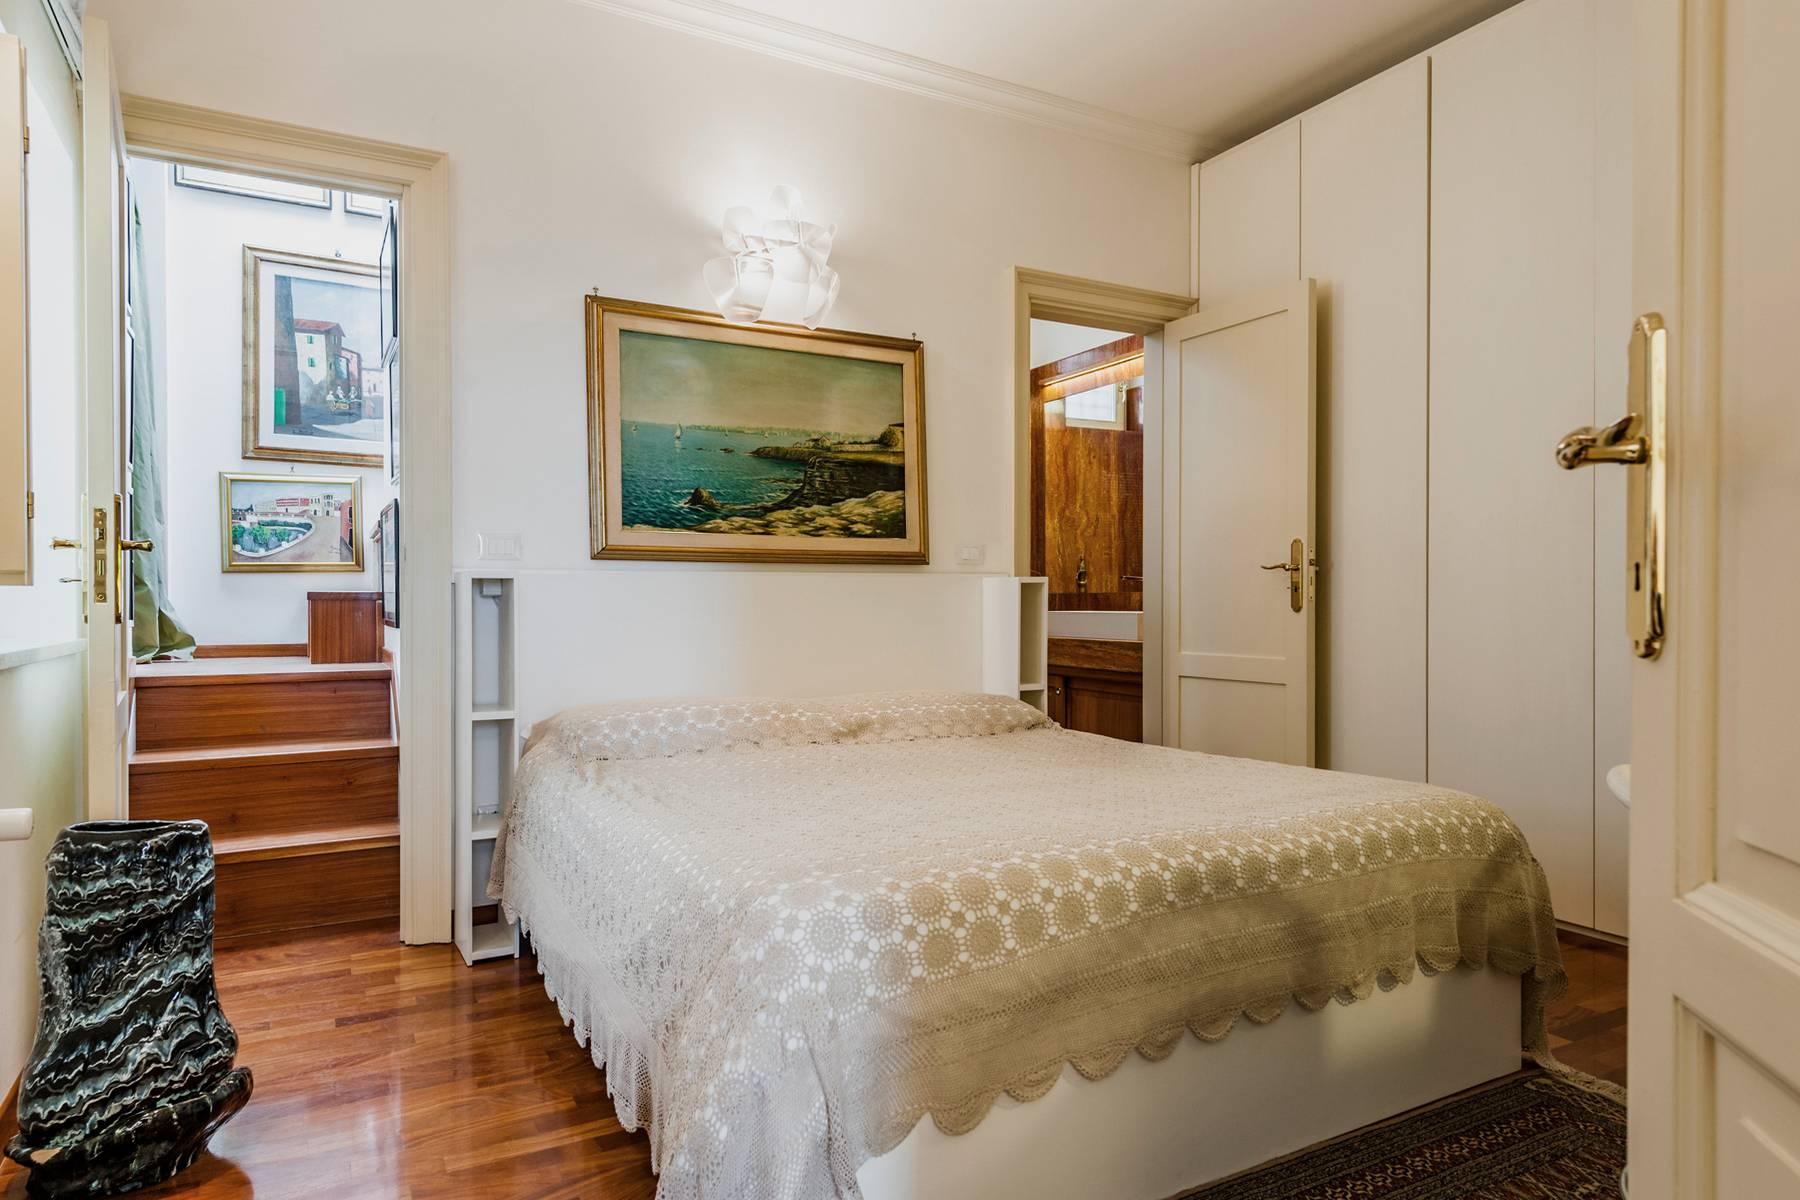 Appartamento in Vendita a Siracusa: 5 locali, 206 mq - Foto 22